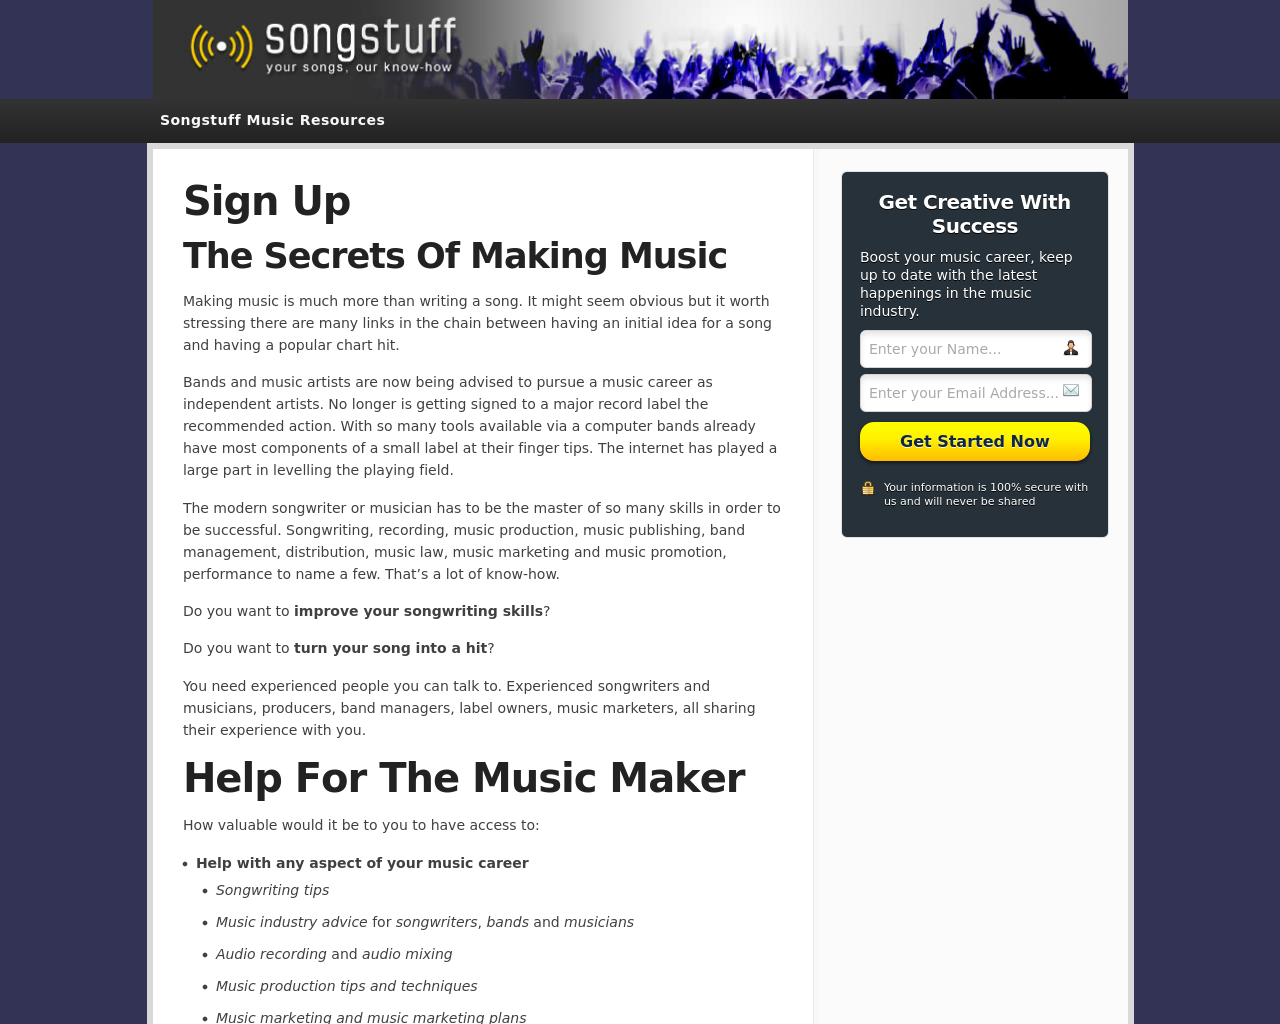 Songstuff-Advertising-Reviews-Pricing